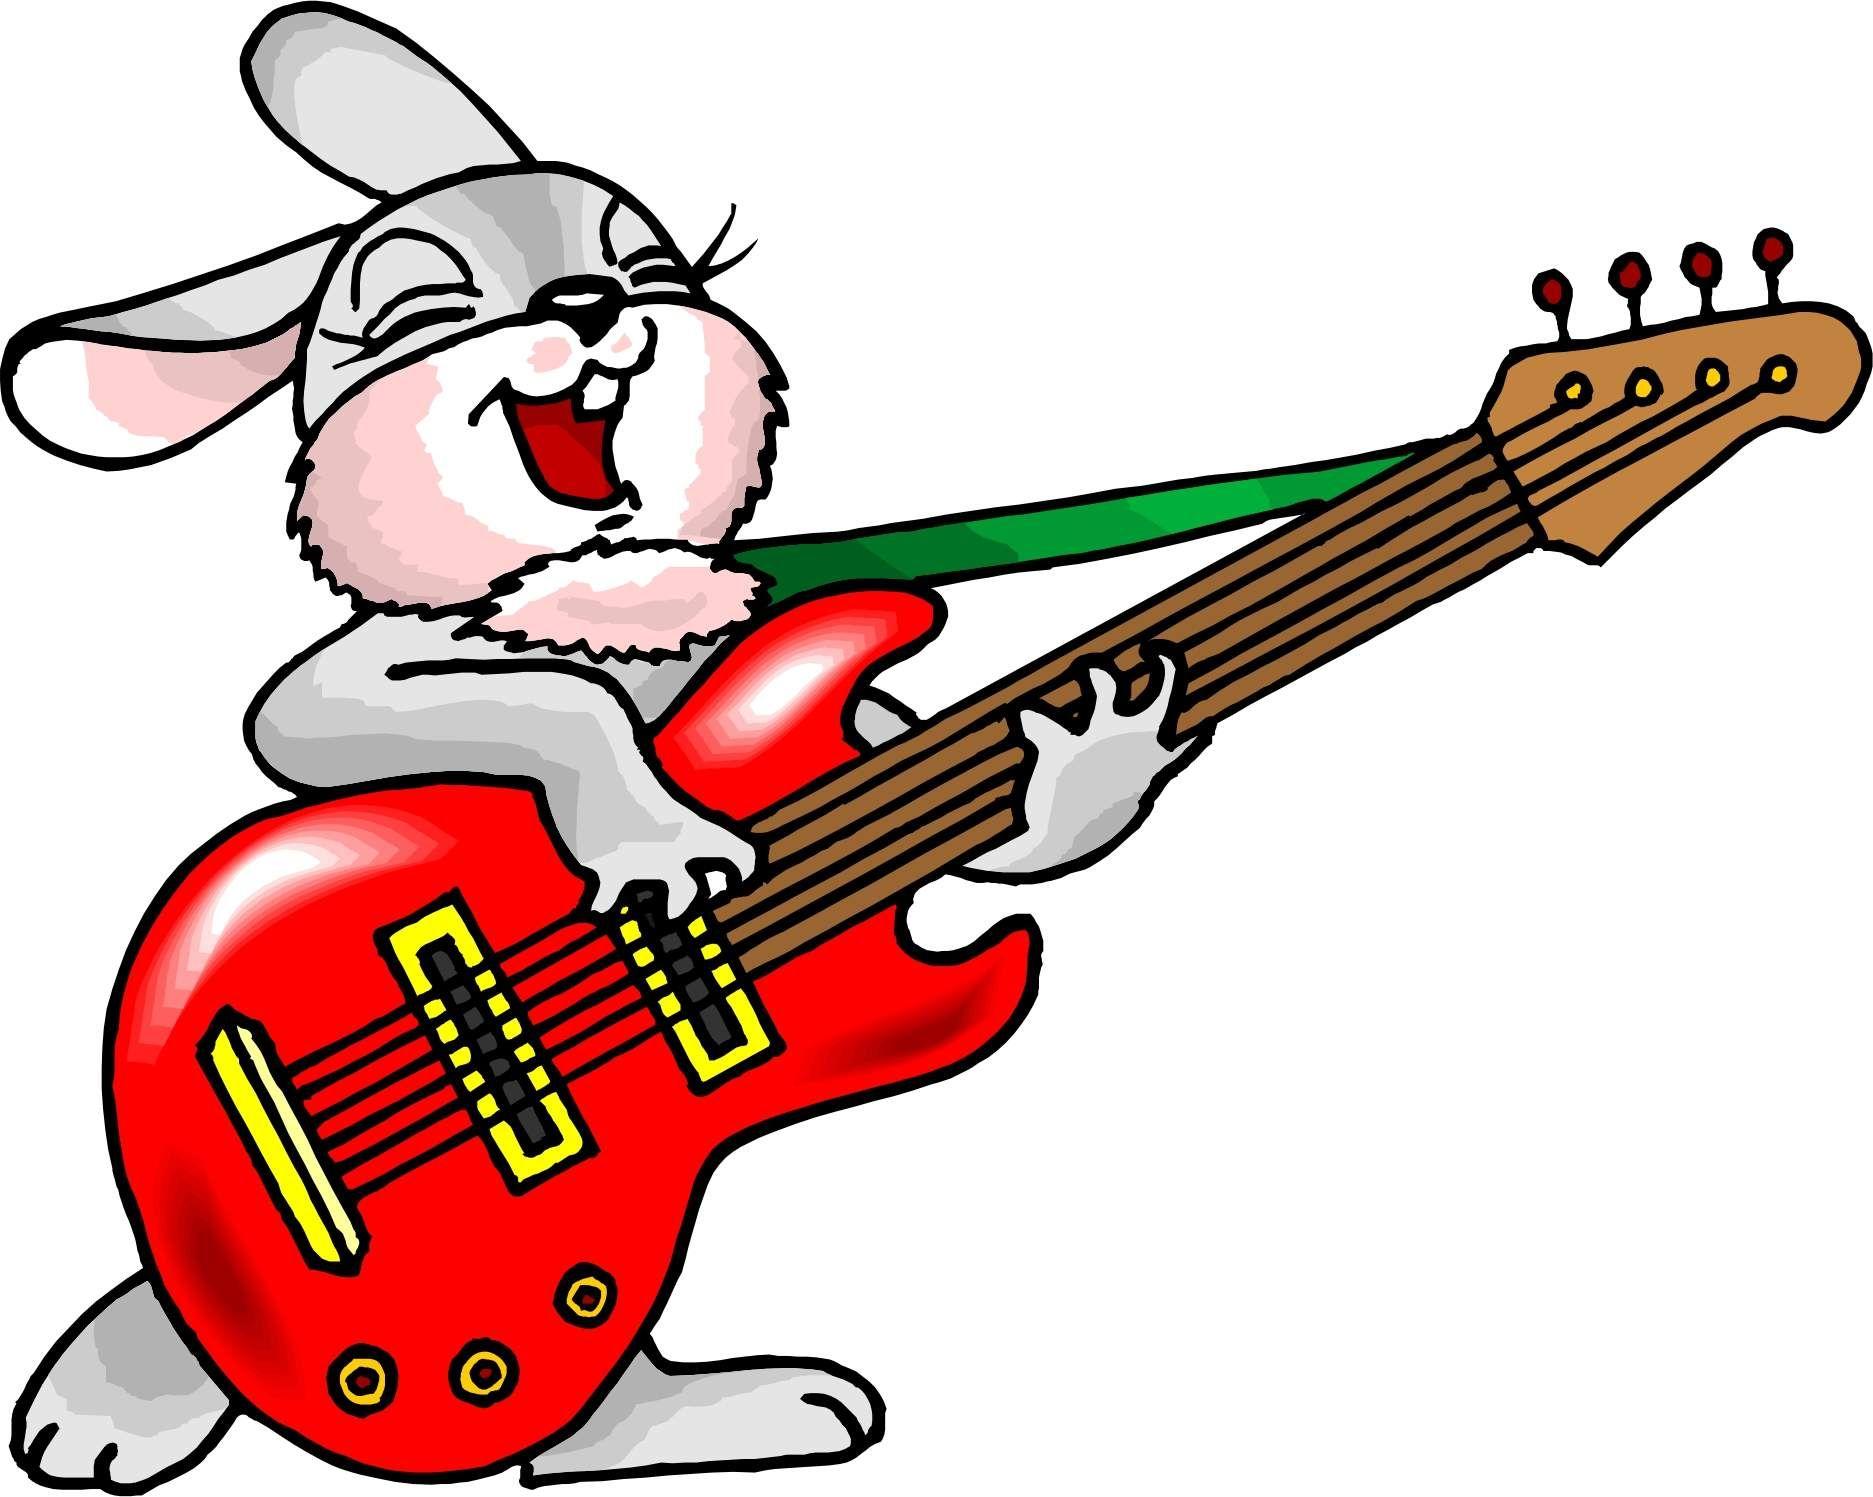 Cartoon Rabbit Playing Guitar Jpg 831683 1873 1497 Guitar Drawing Easter Show Bunny Images